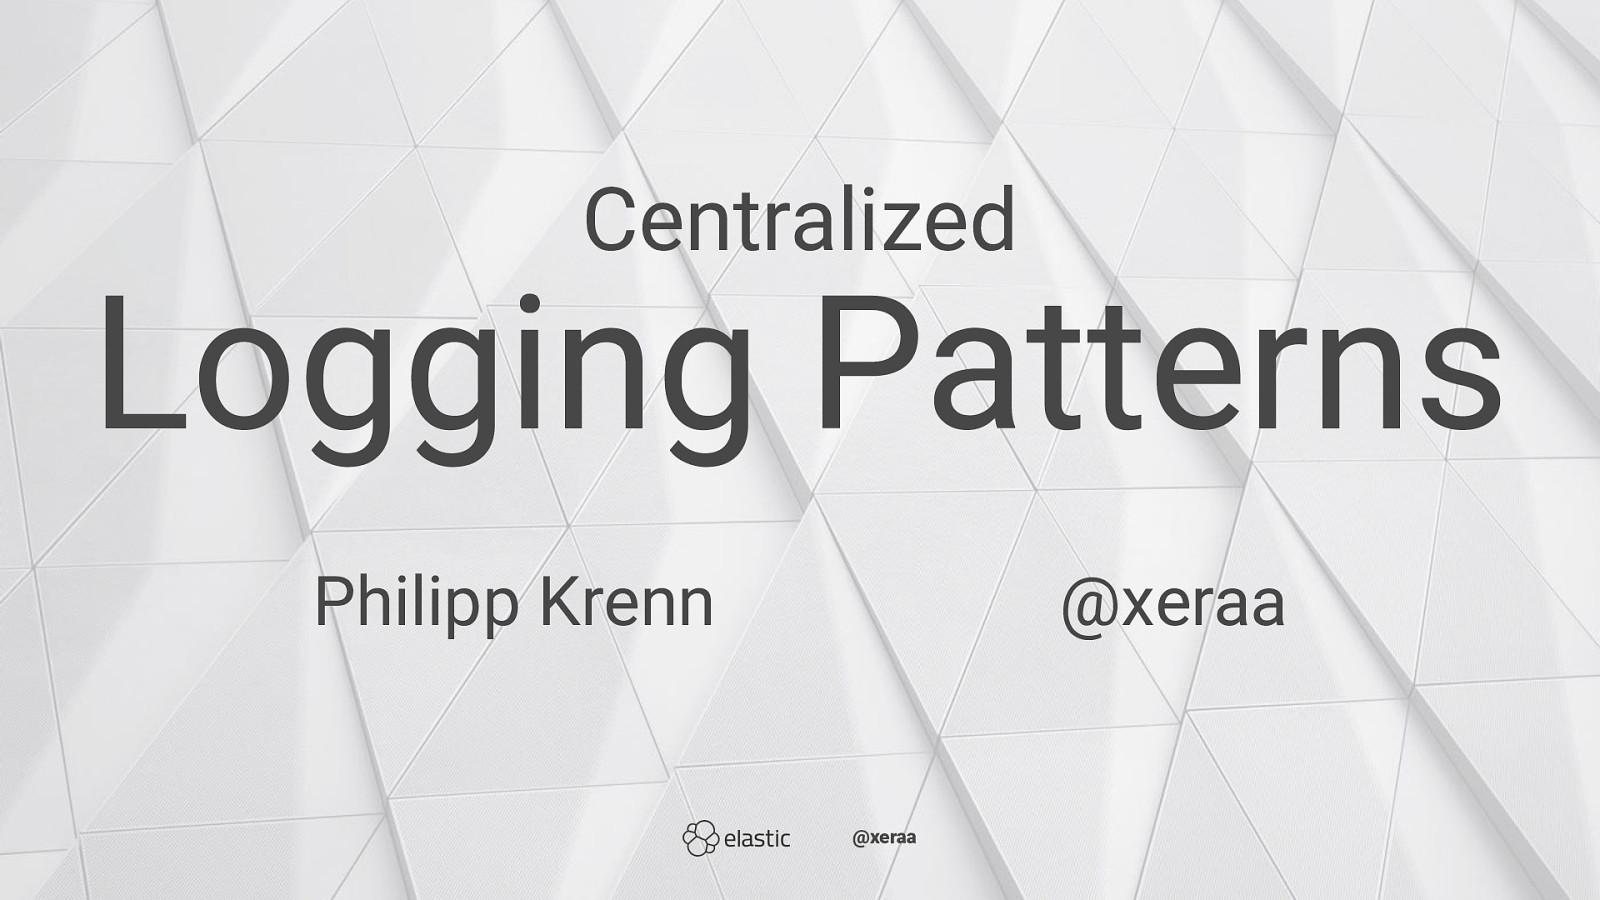 Centralized Logging Patterns